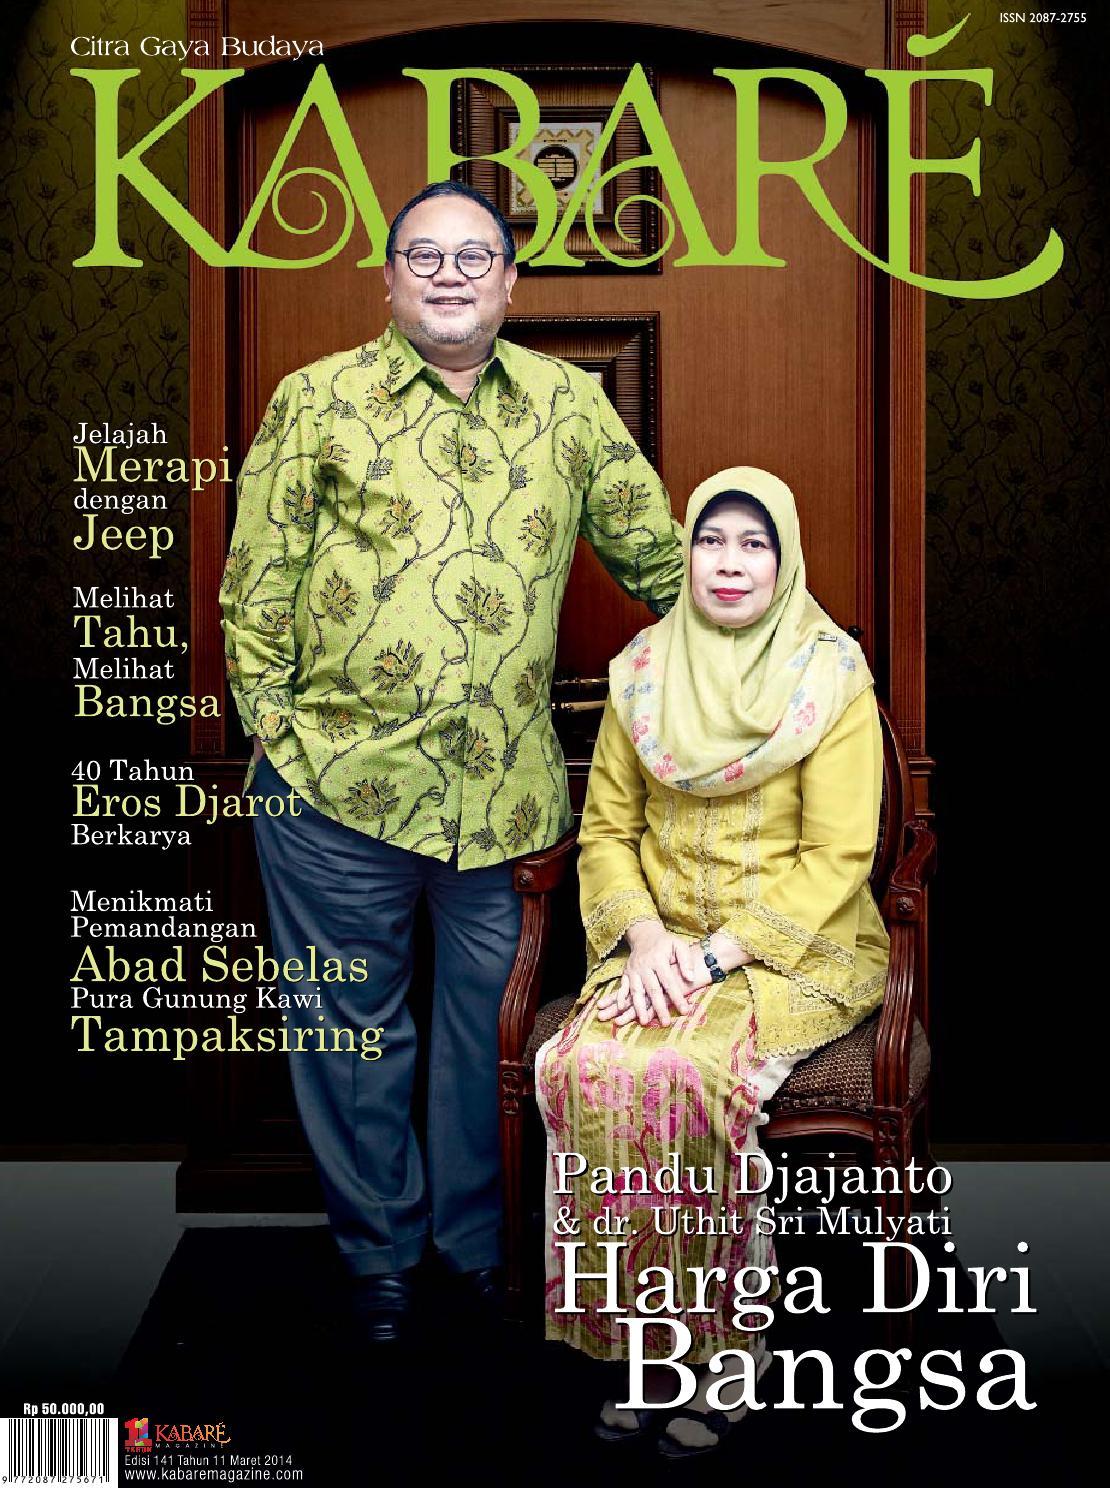 Kabare Magazine Edisi Maret 2014 By Issuu Produk Ukm Bumn Dress Gamis Batik Motif Ayam Bekisar